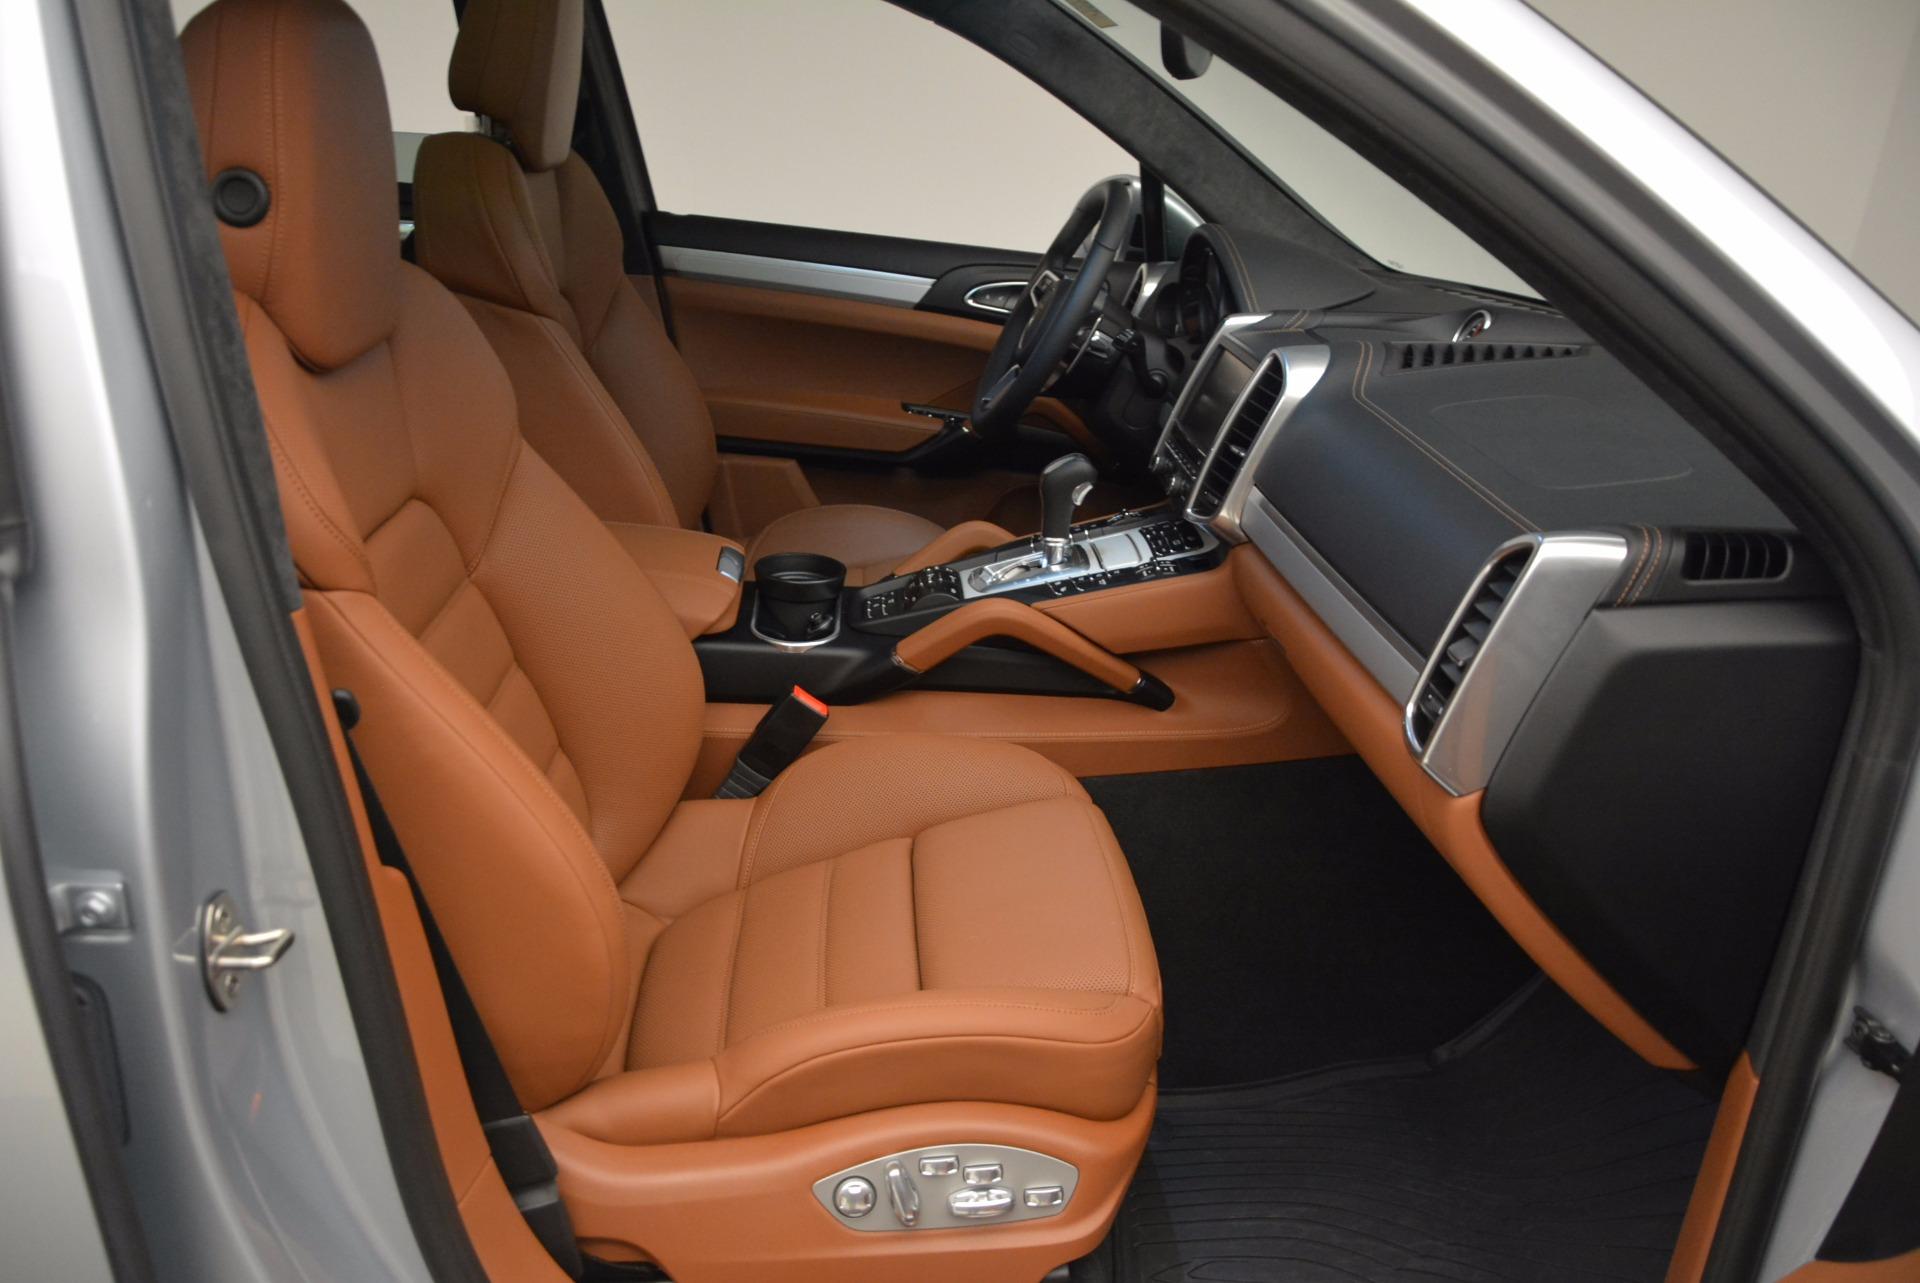 Used 2016 Porsche Cayenne Turbo For Sale In Greenwich, CT. Alfa Romeo of Greenwich, 7165 1000_p43